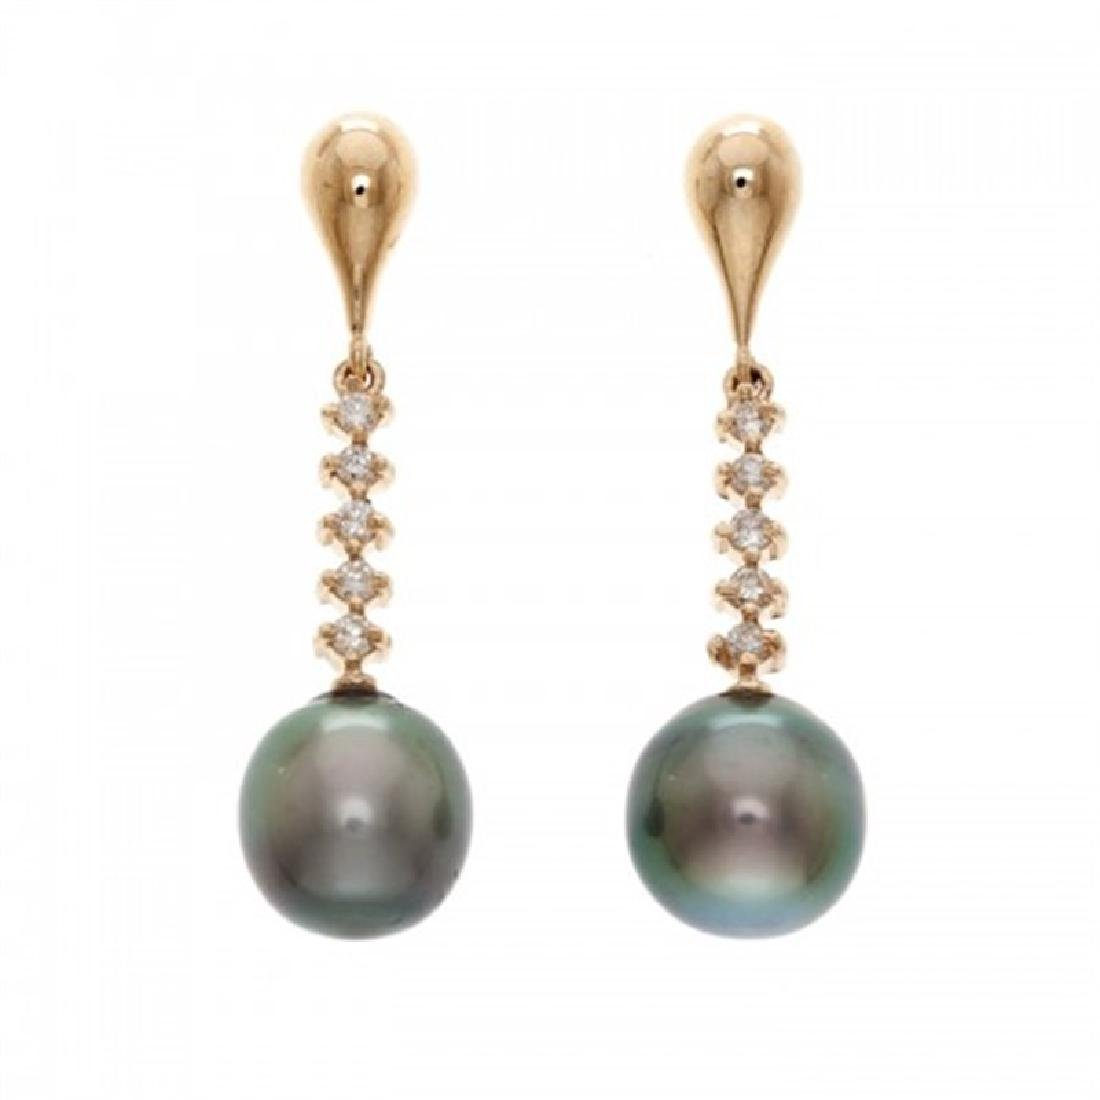 10.0-11.0mm Tahitian Pearl Earrings with Diamonds